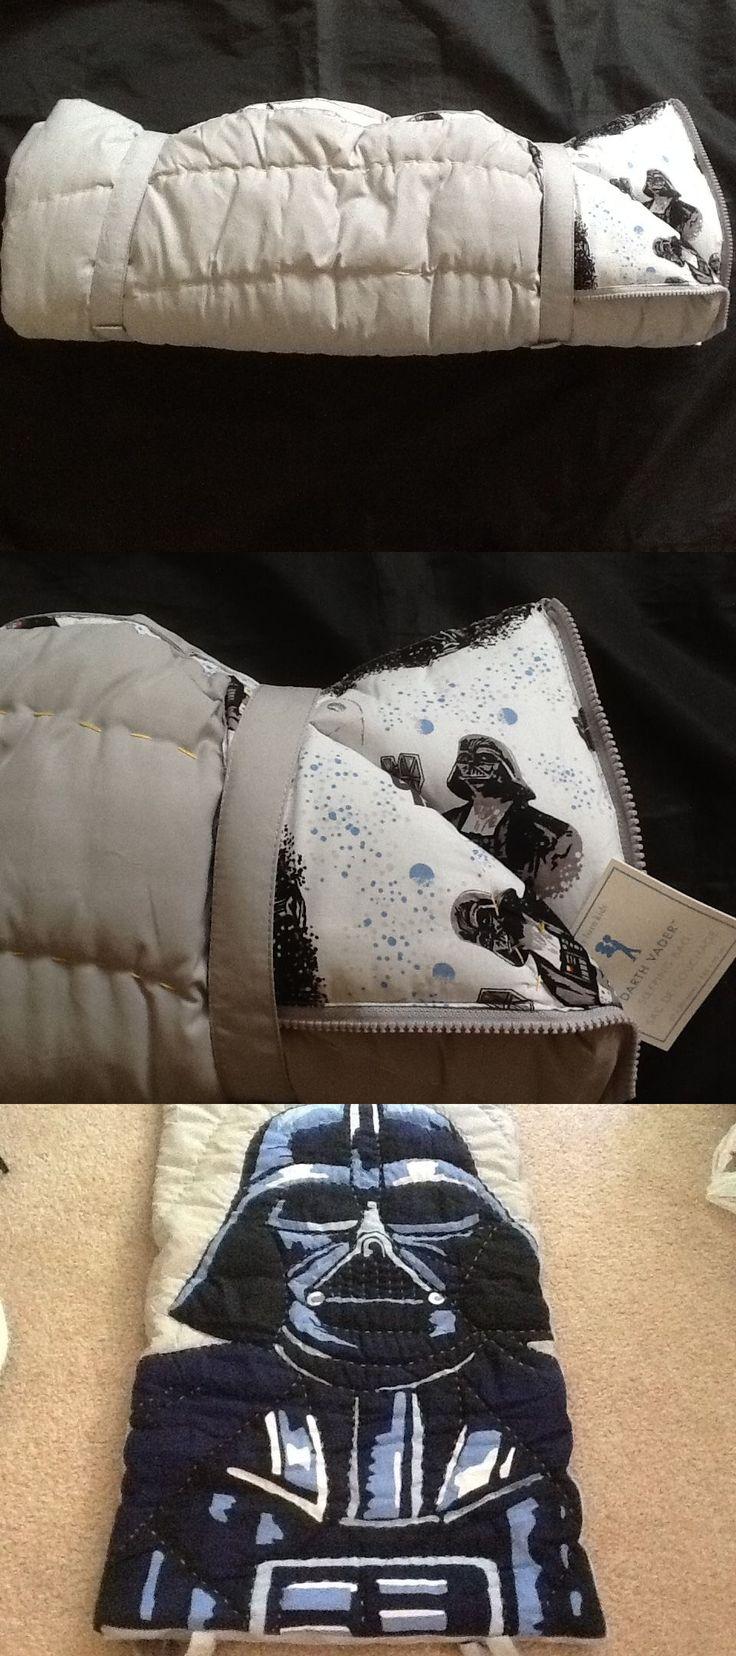 Sleeping Bags 48091: Pottery Barn Kids Star Wars Darth Vader Sleeping Bag Gray Navy New -> BUY IT NOW ONLY: $89 on eBay!